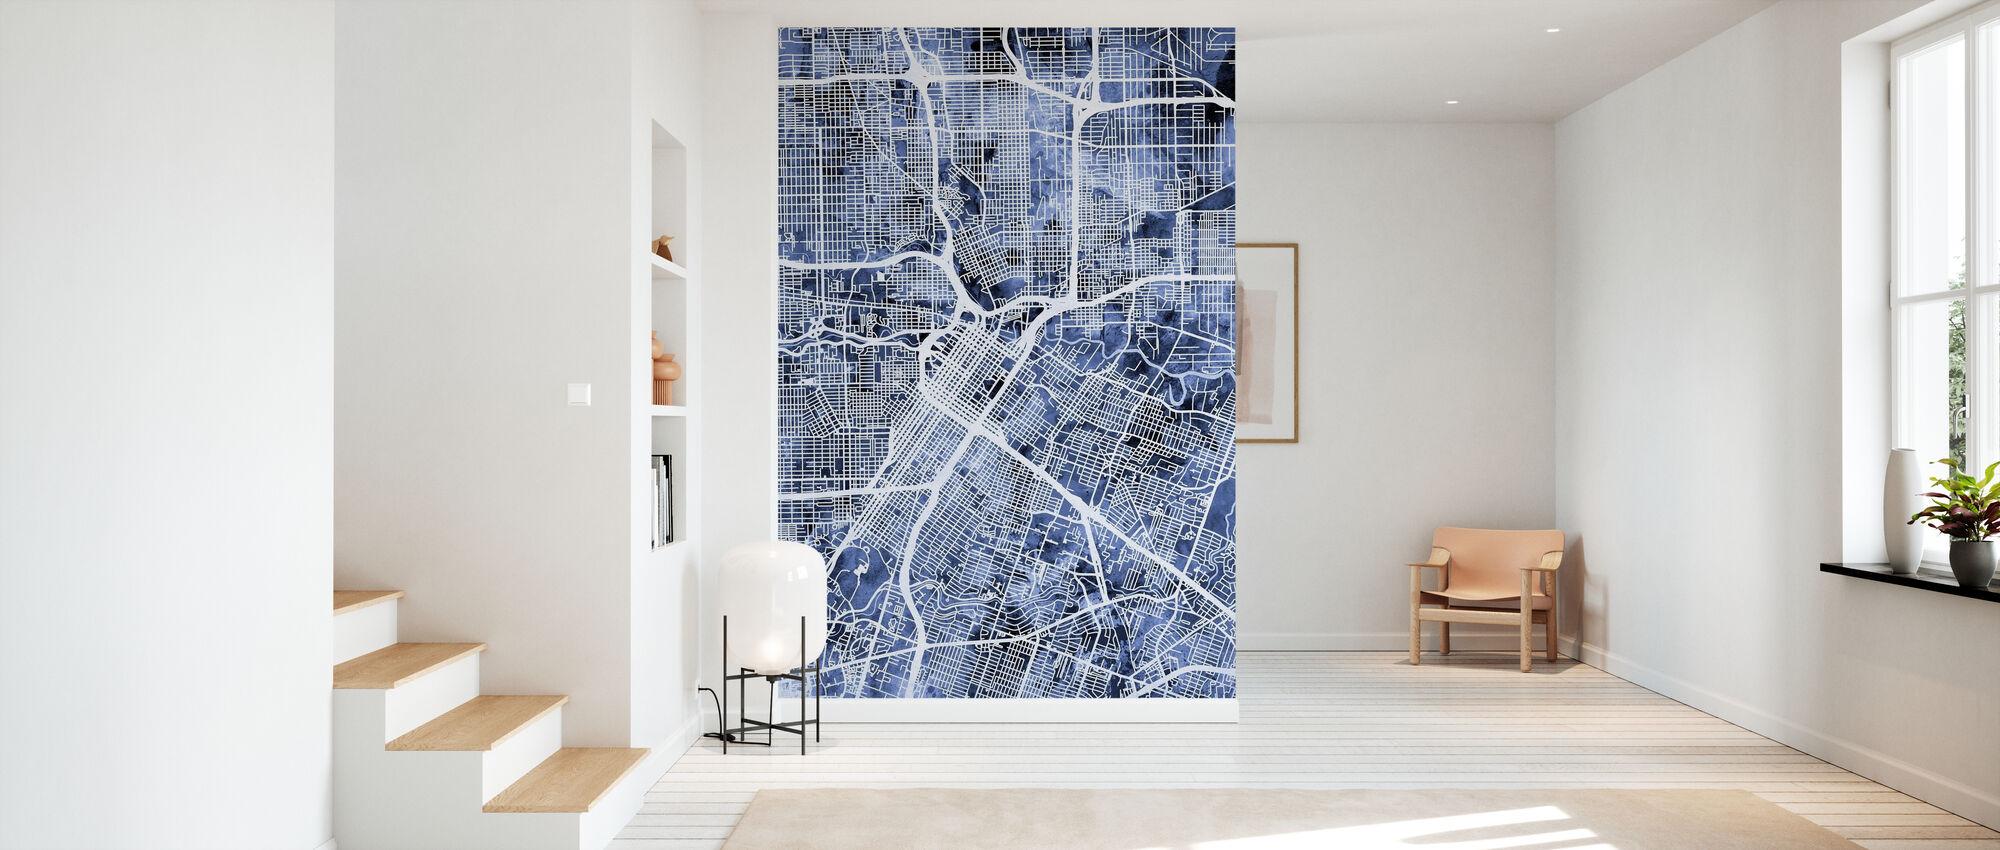 Houston Texas City Street Map - Wallpaper - Hallway